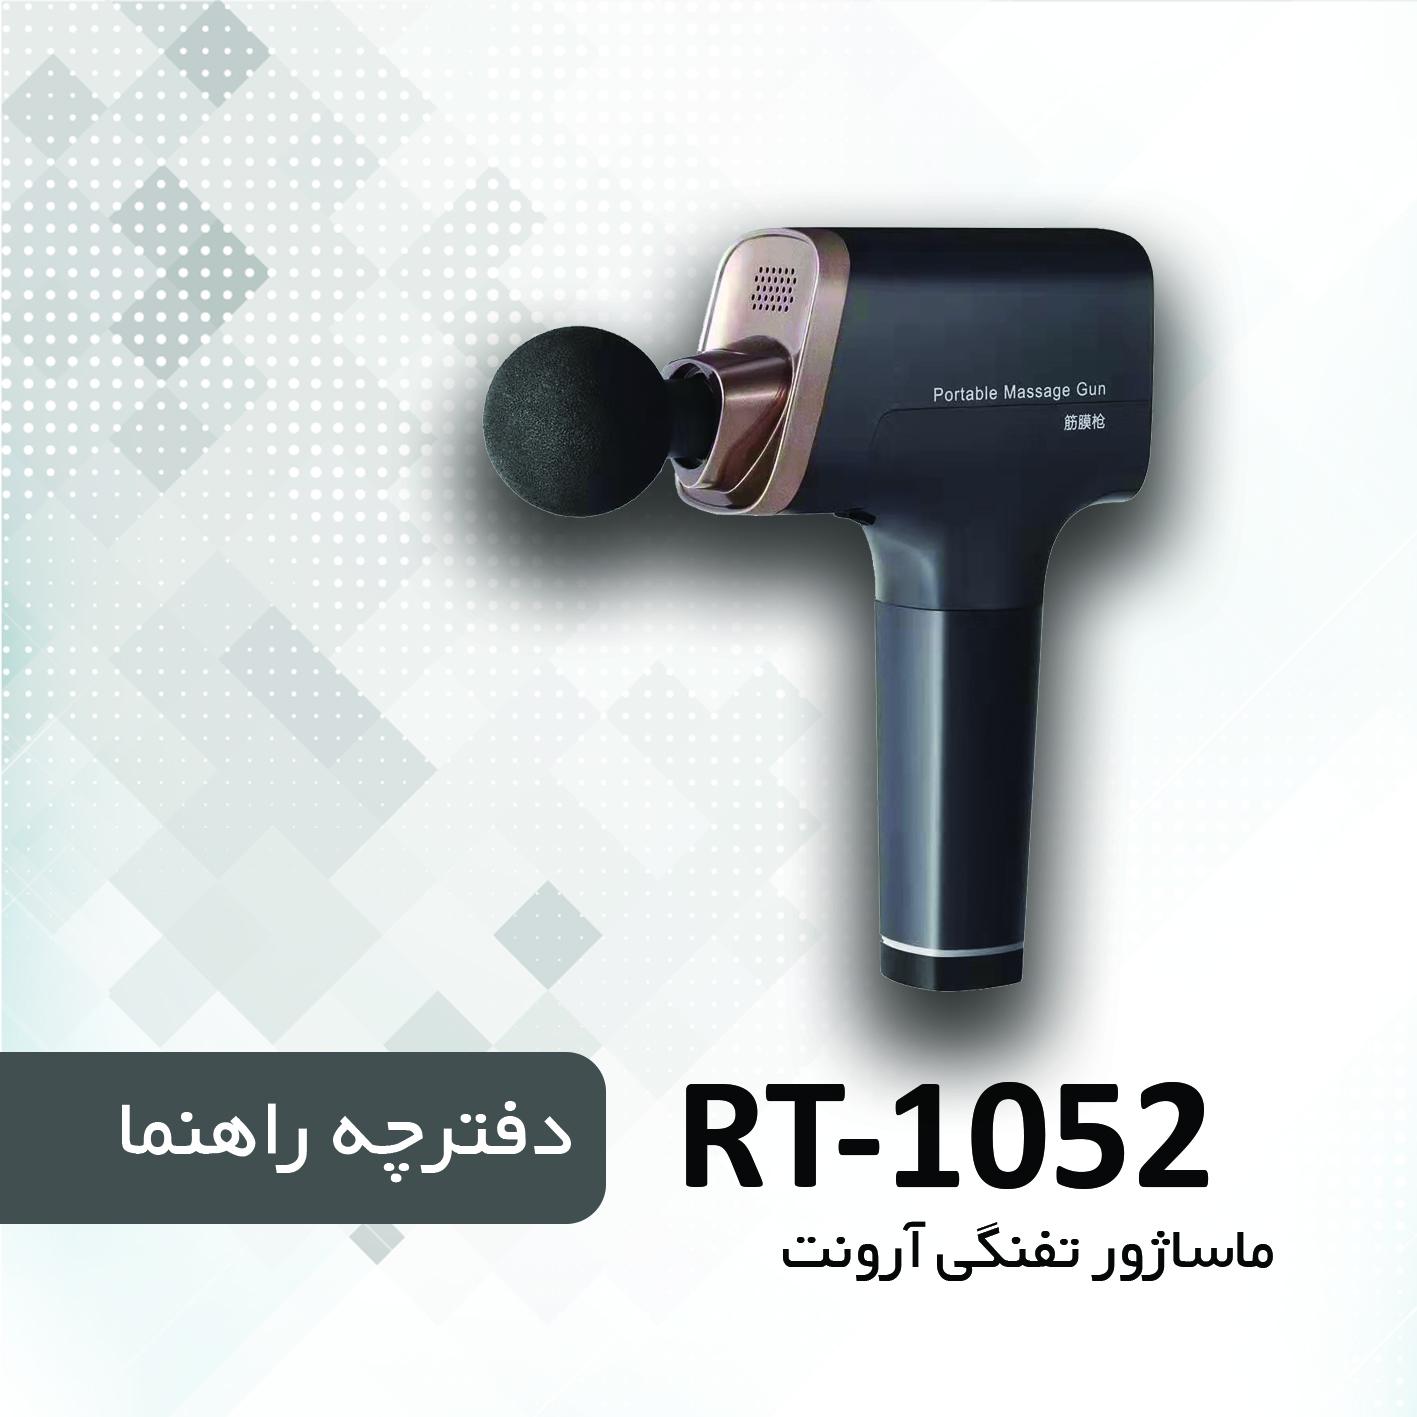 RT-1052